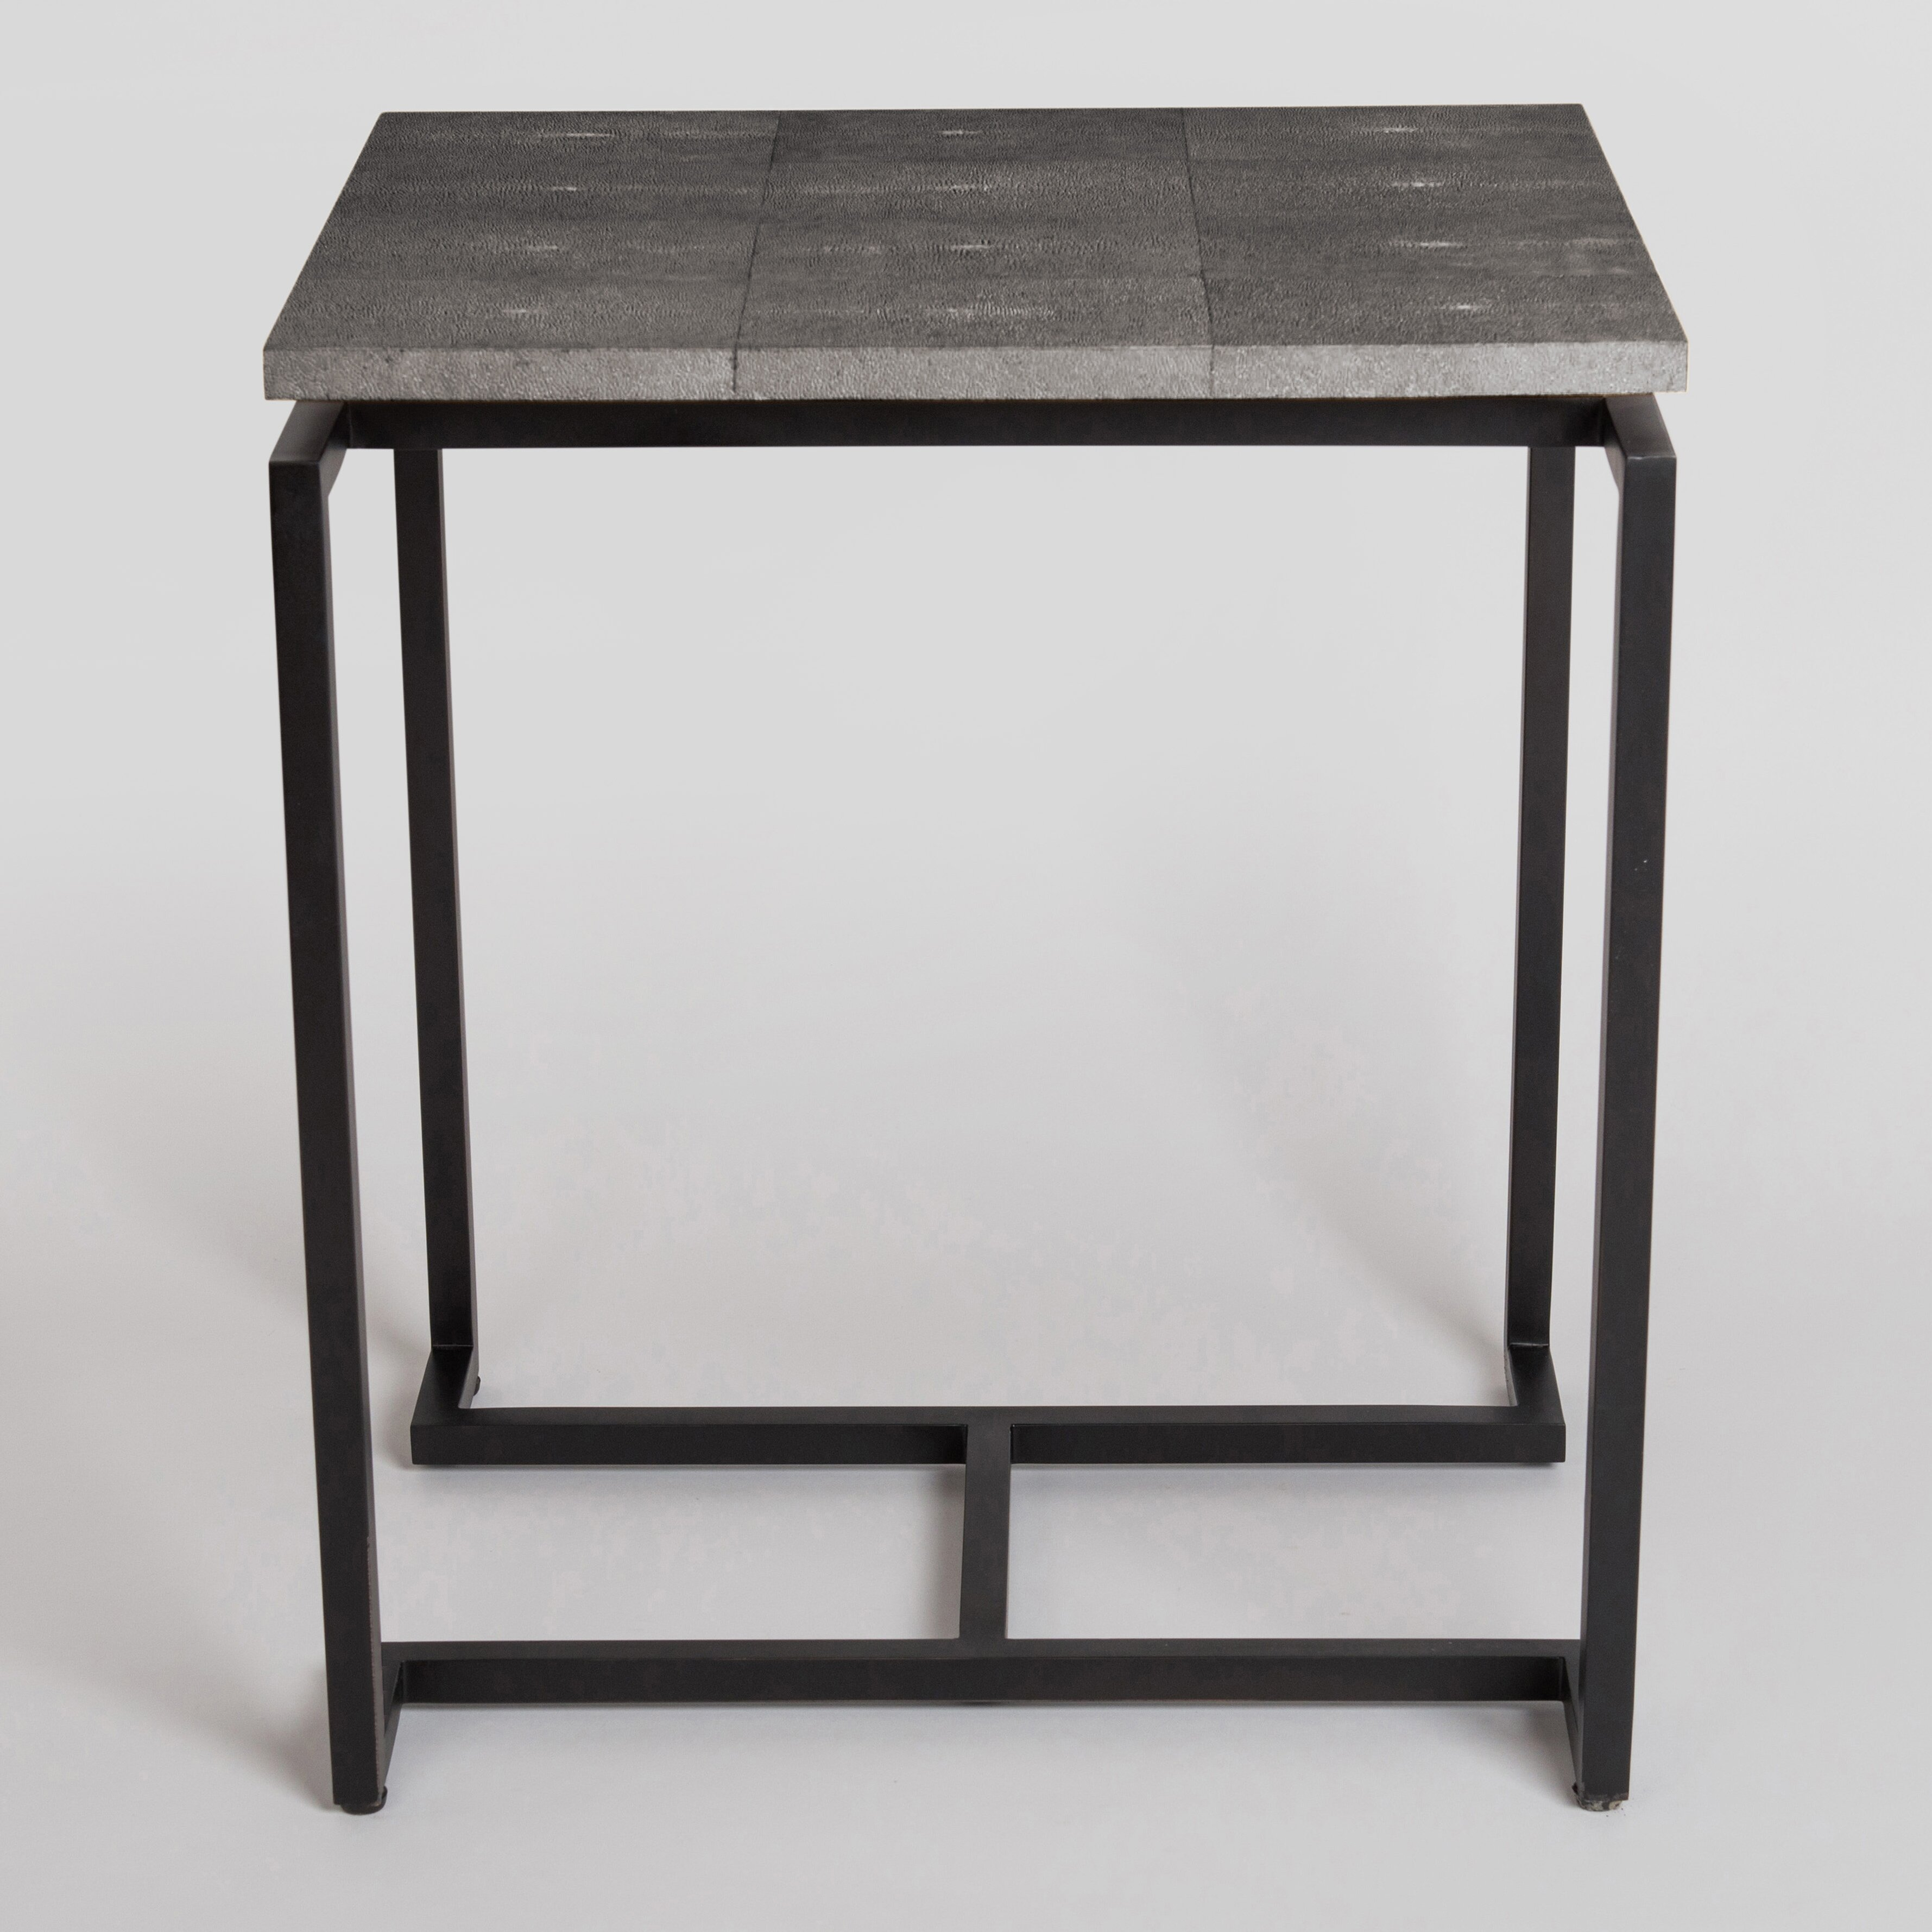 amaris elements beistelltisch taylor. Black Bedroom Furniture Sets. Home Design Ideas